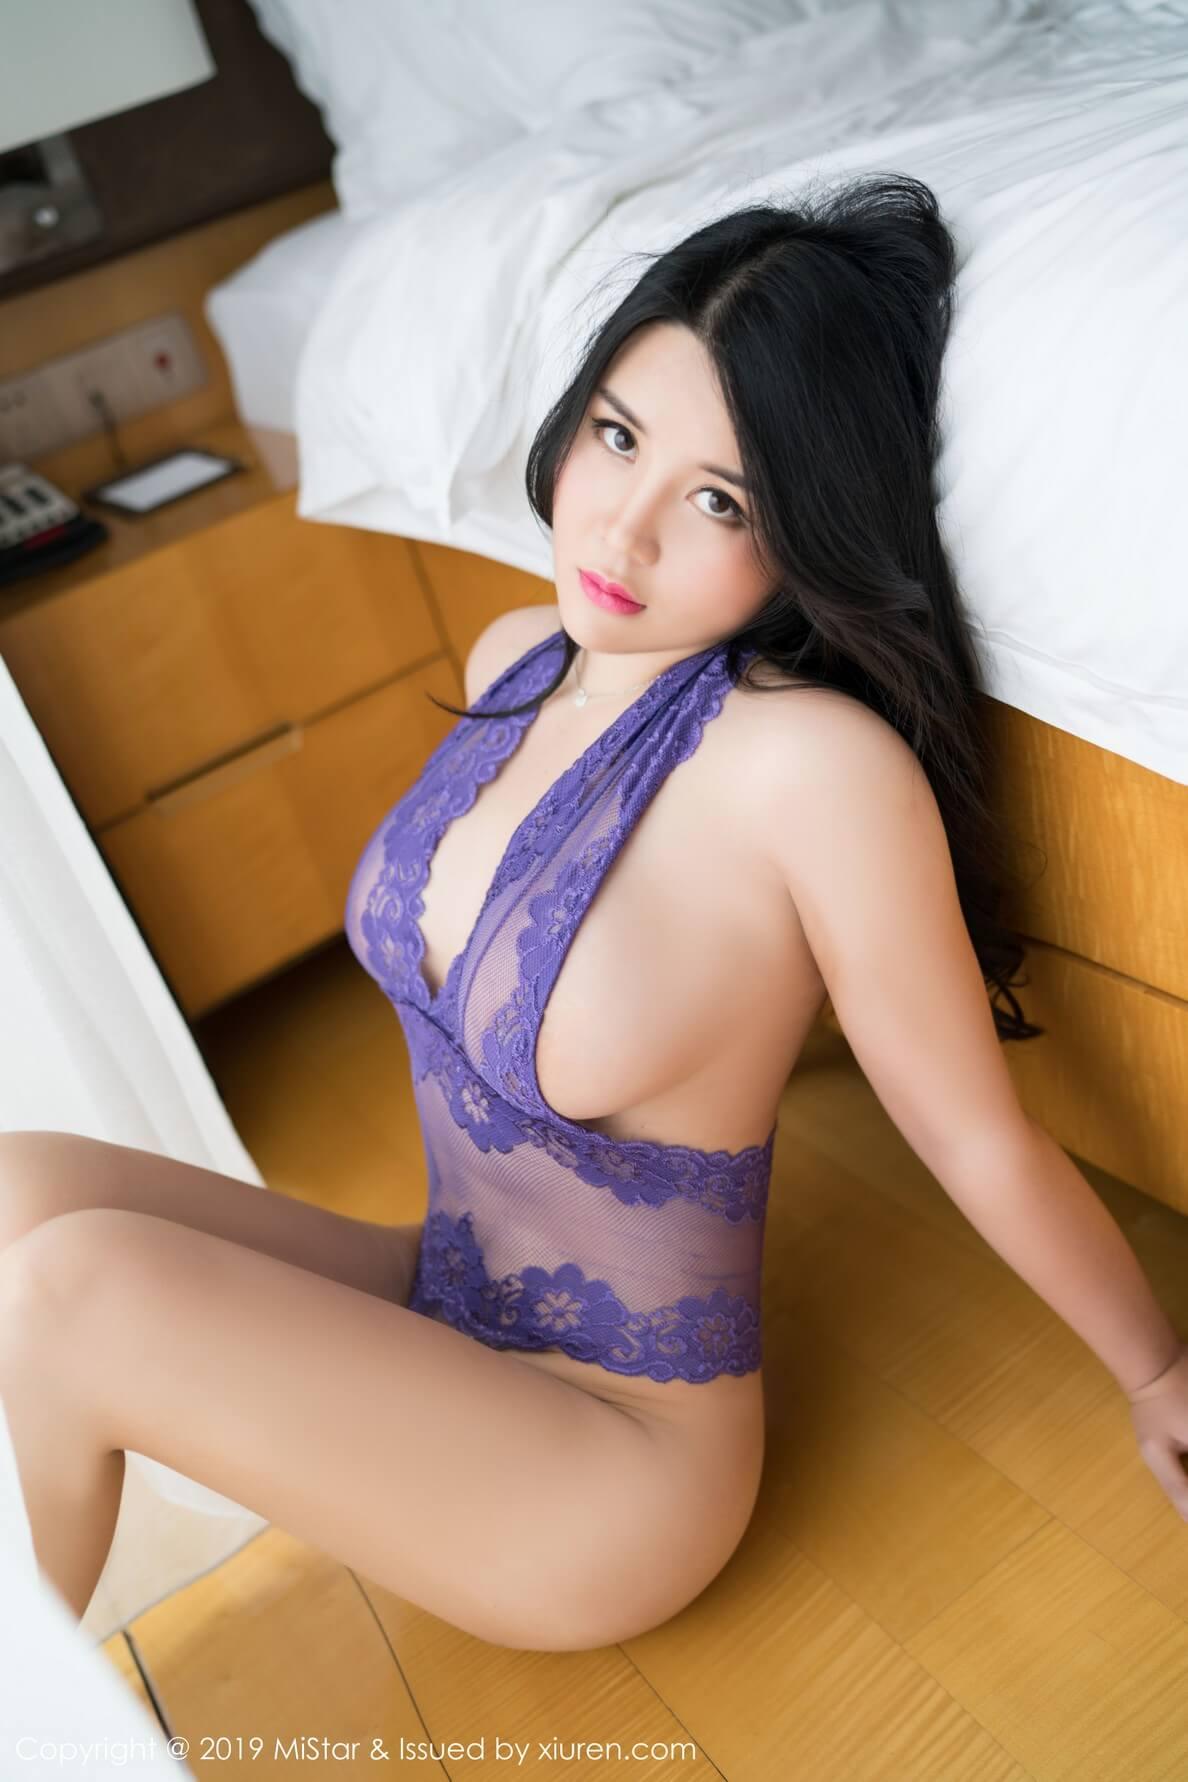 Asian Cuties Gallery asian cutie with big tits sukki sexy photoshootmistar